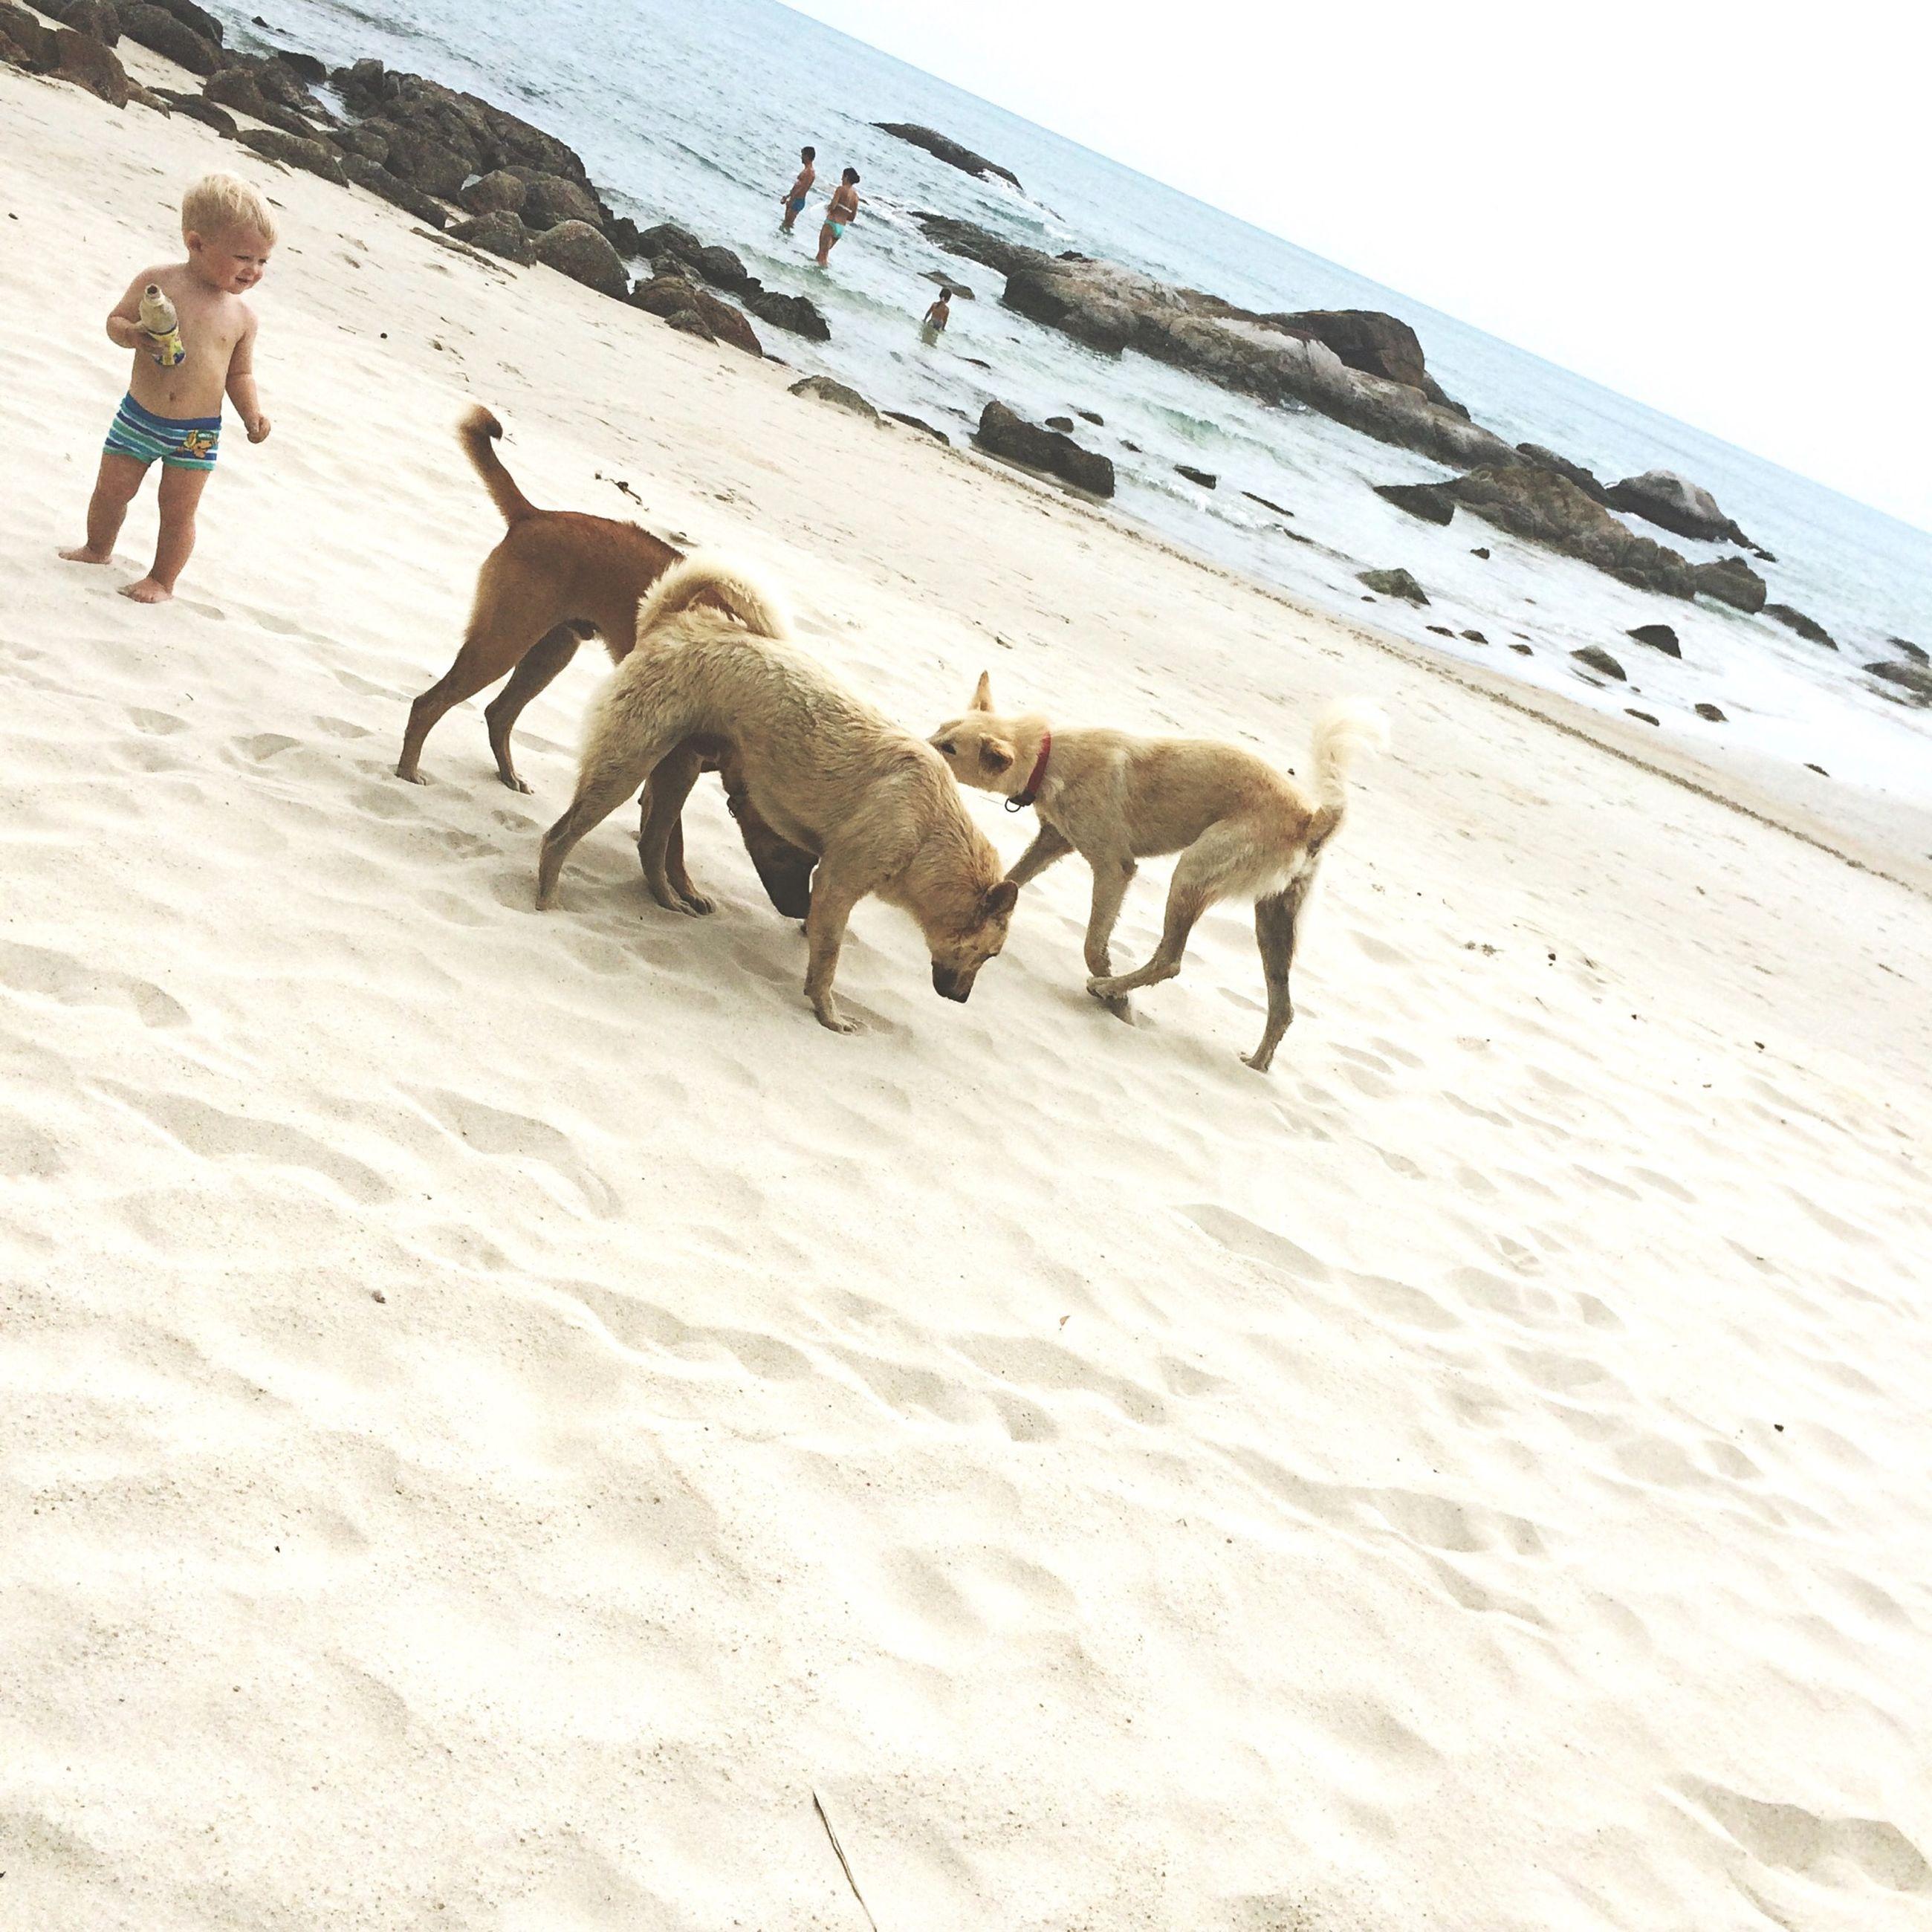 animal themes, beach, sand, mammal, domestic animals, shore, walking, animals in the wild, full length, wildlife, sea, nature, camel, water, bird, day, medium group of animals, outdoors